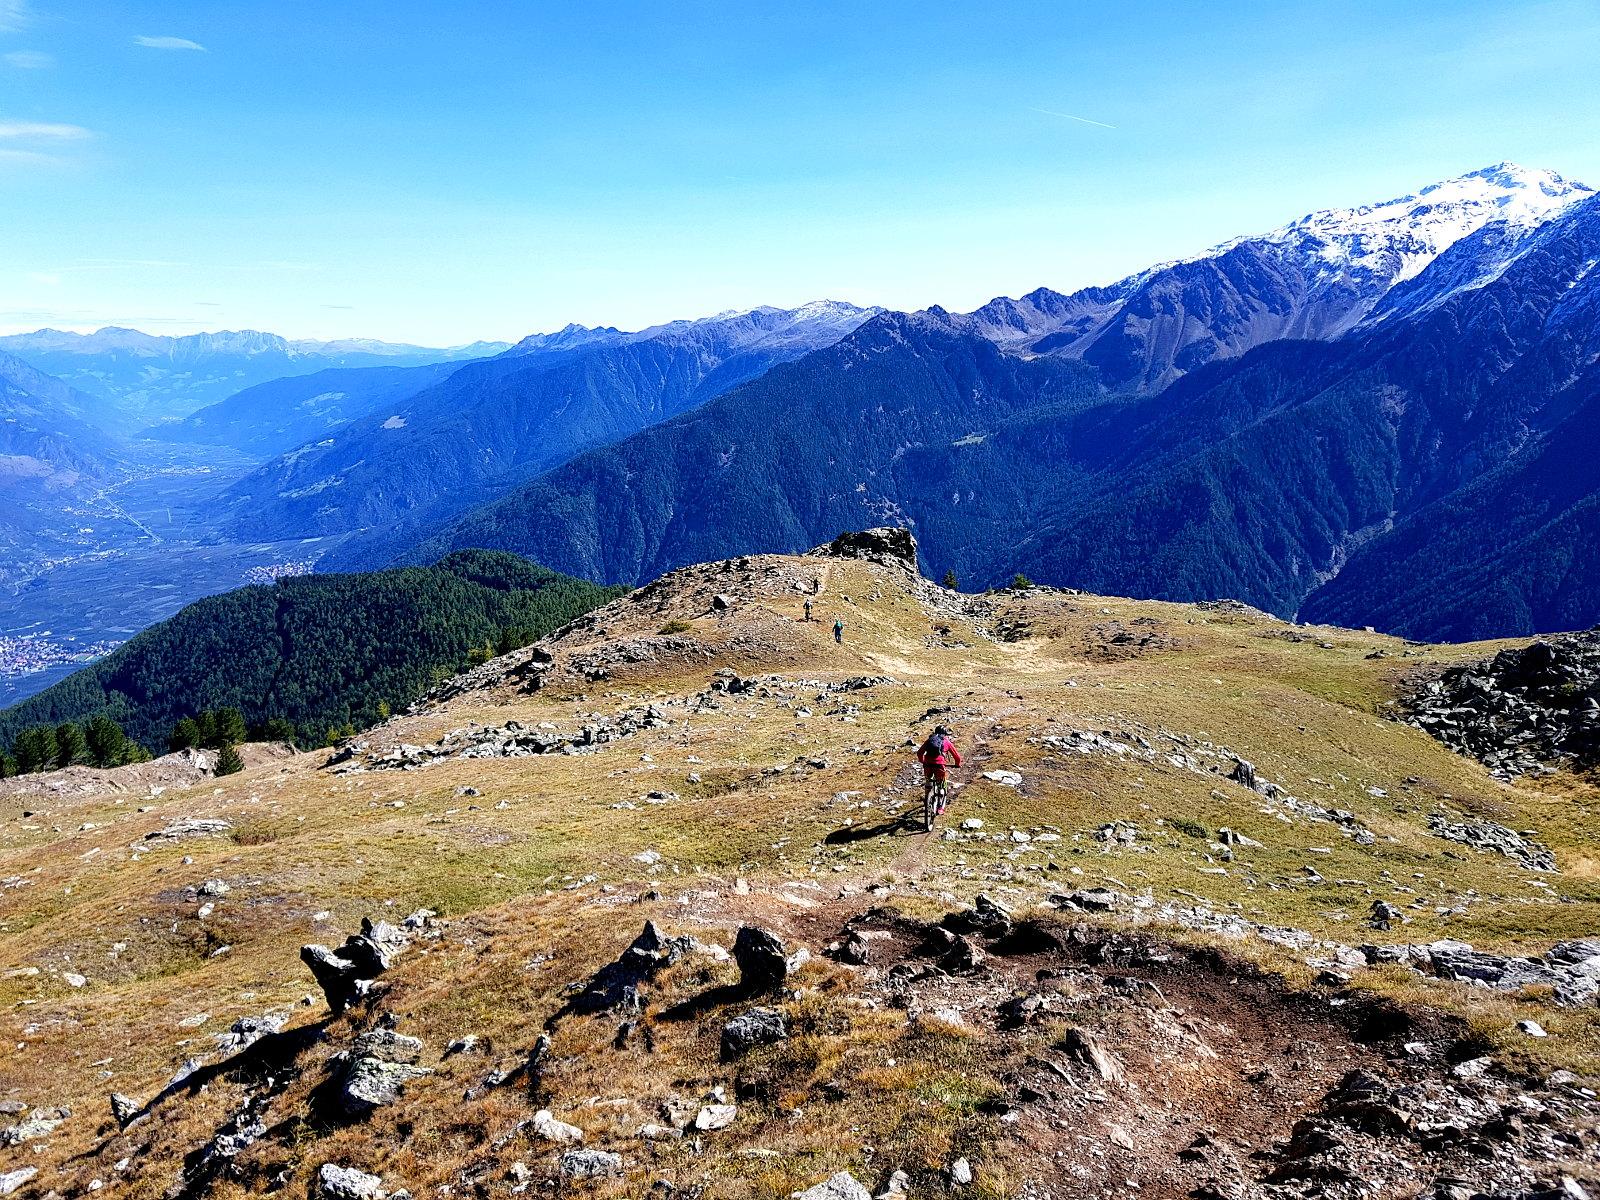 Vinschger alpine Trails begleiten uns